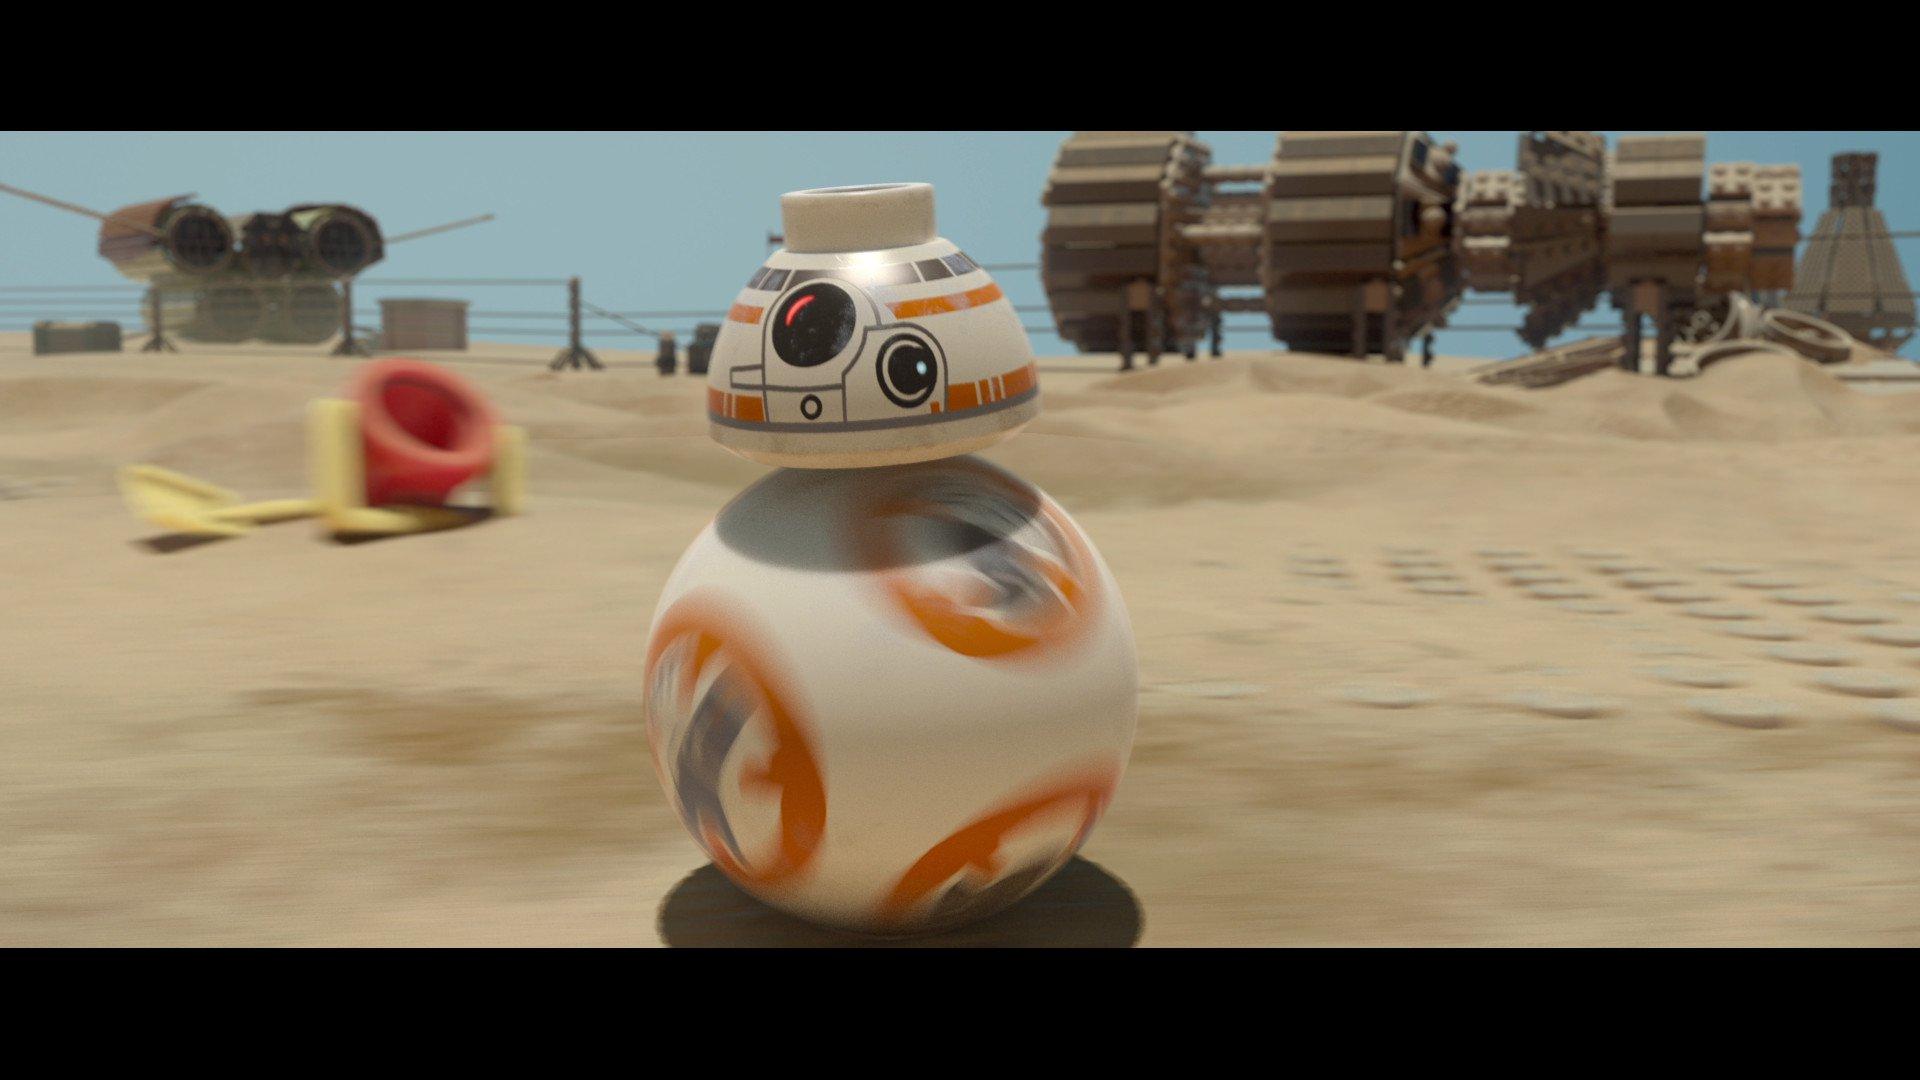 LEGO Star Wars The Force Awakens 10